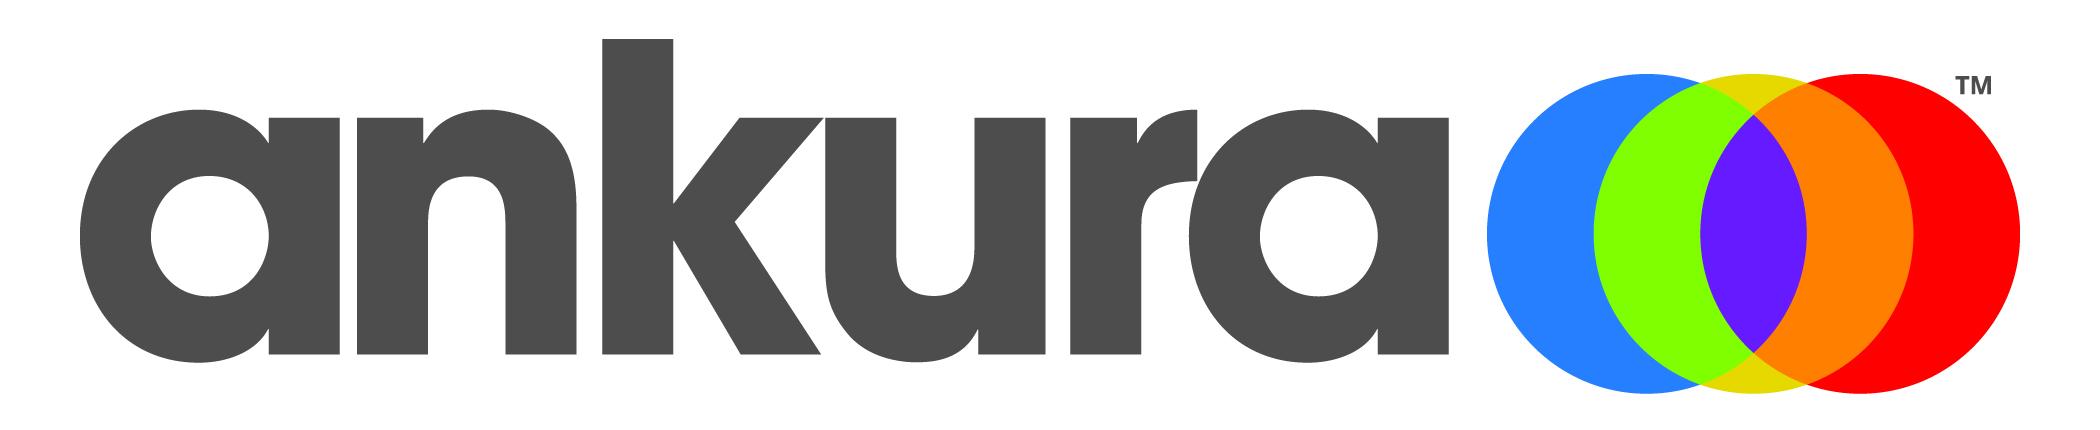 ankura_logo_cmyk